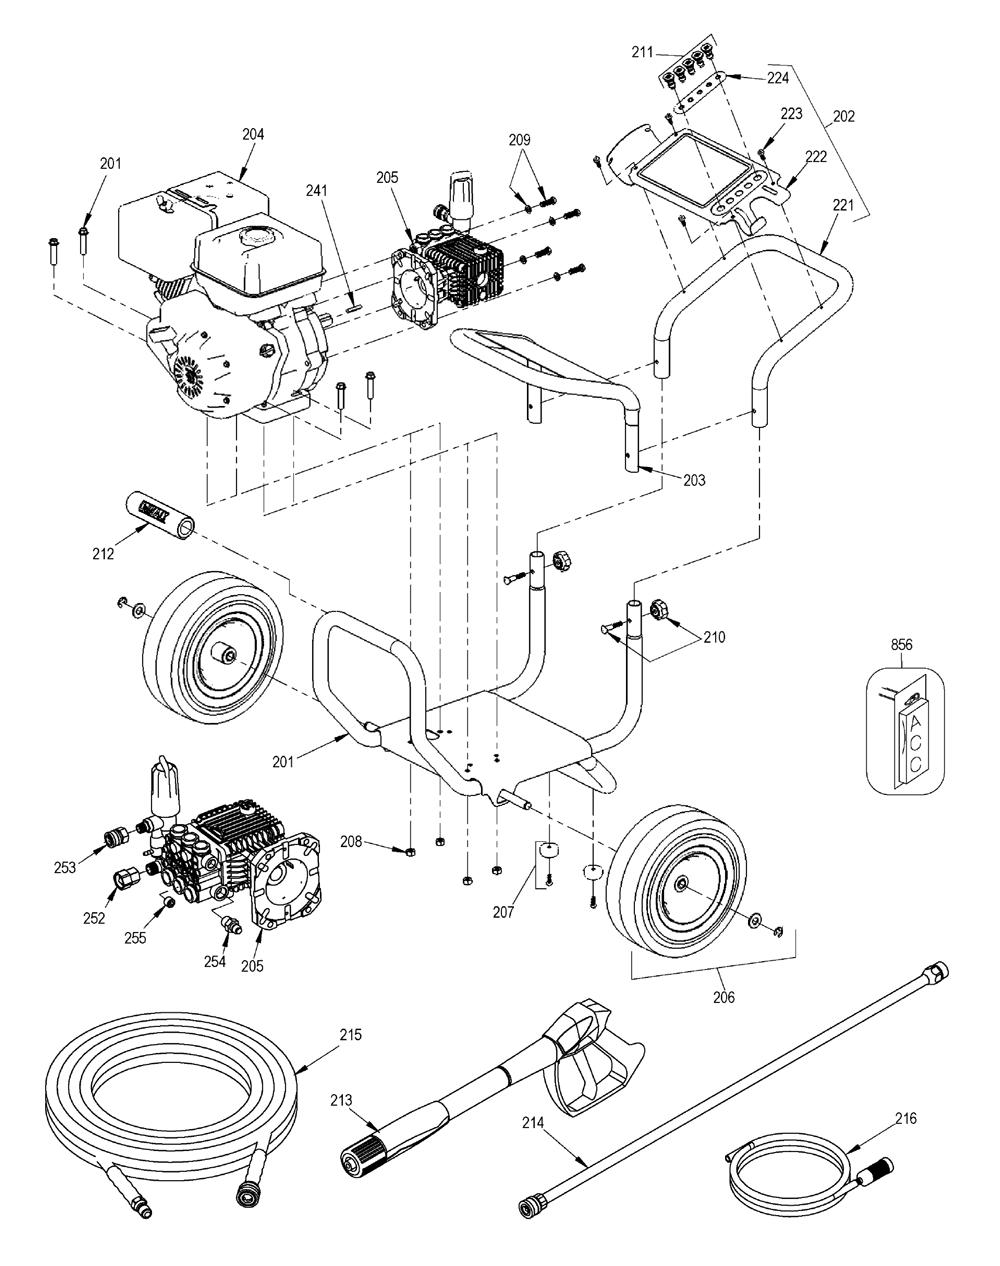 DXPW4240-T0-Dewalt-PB-2Break Down